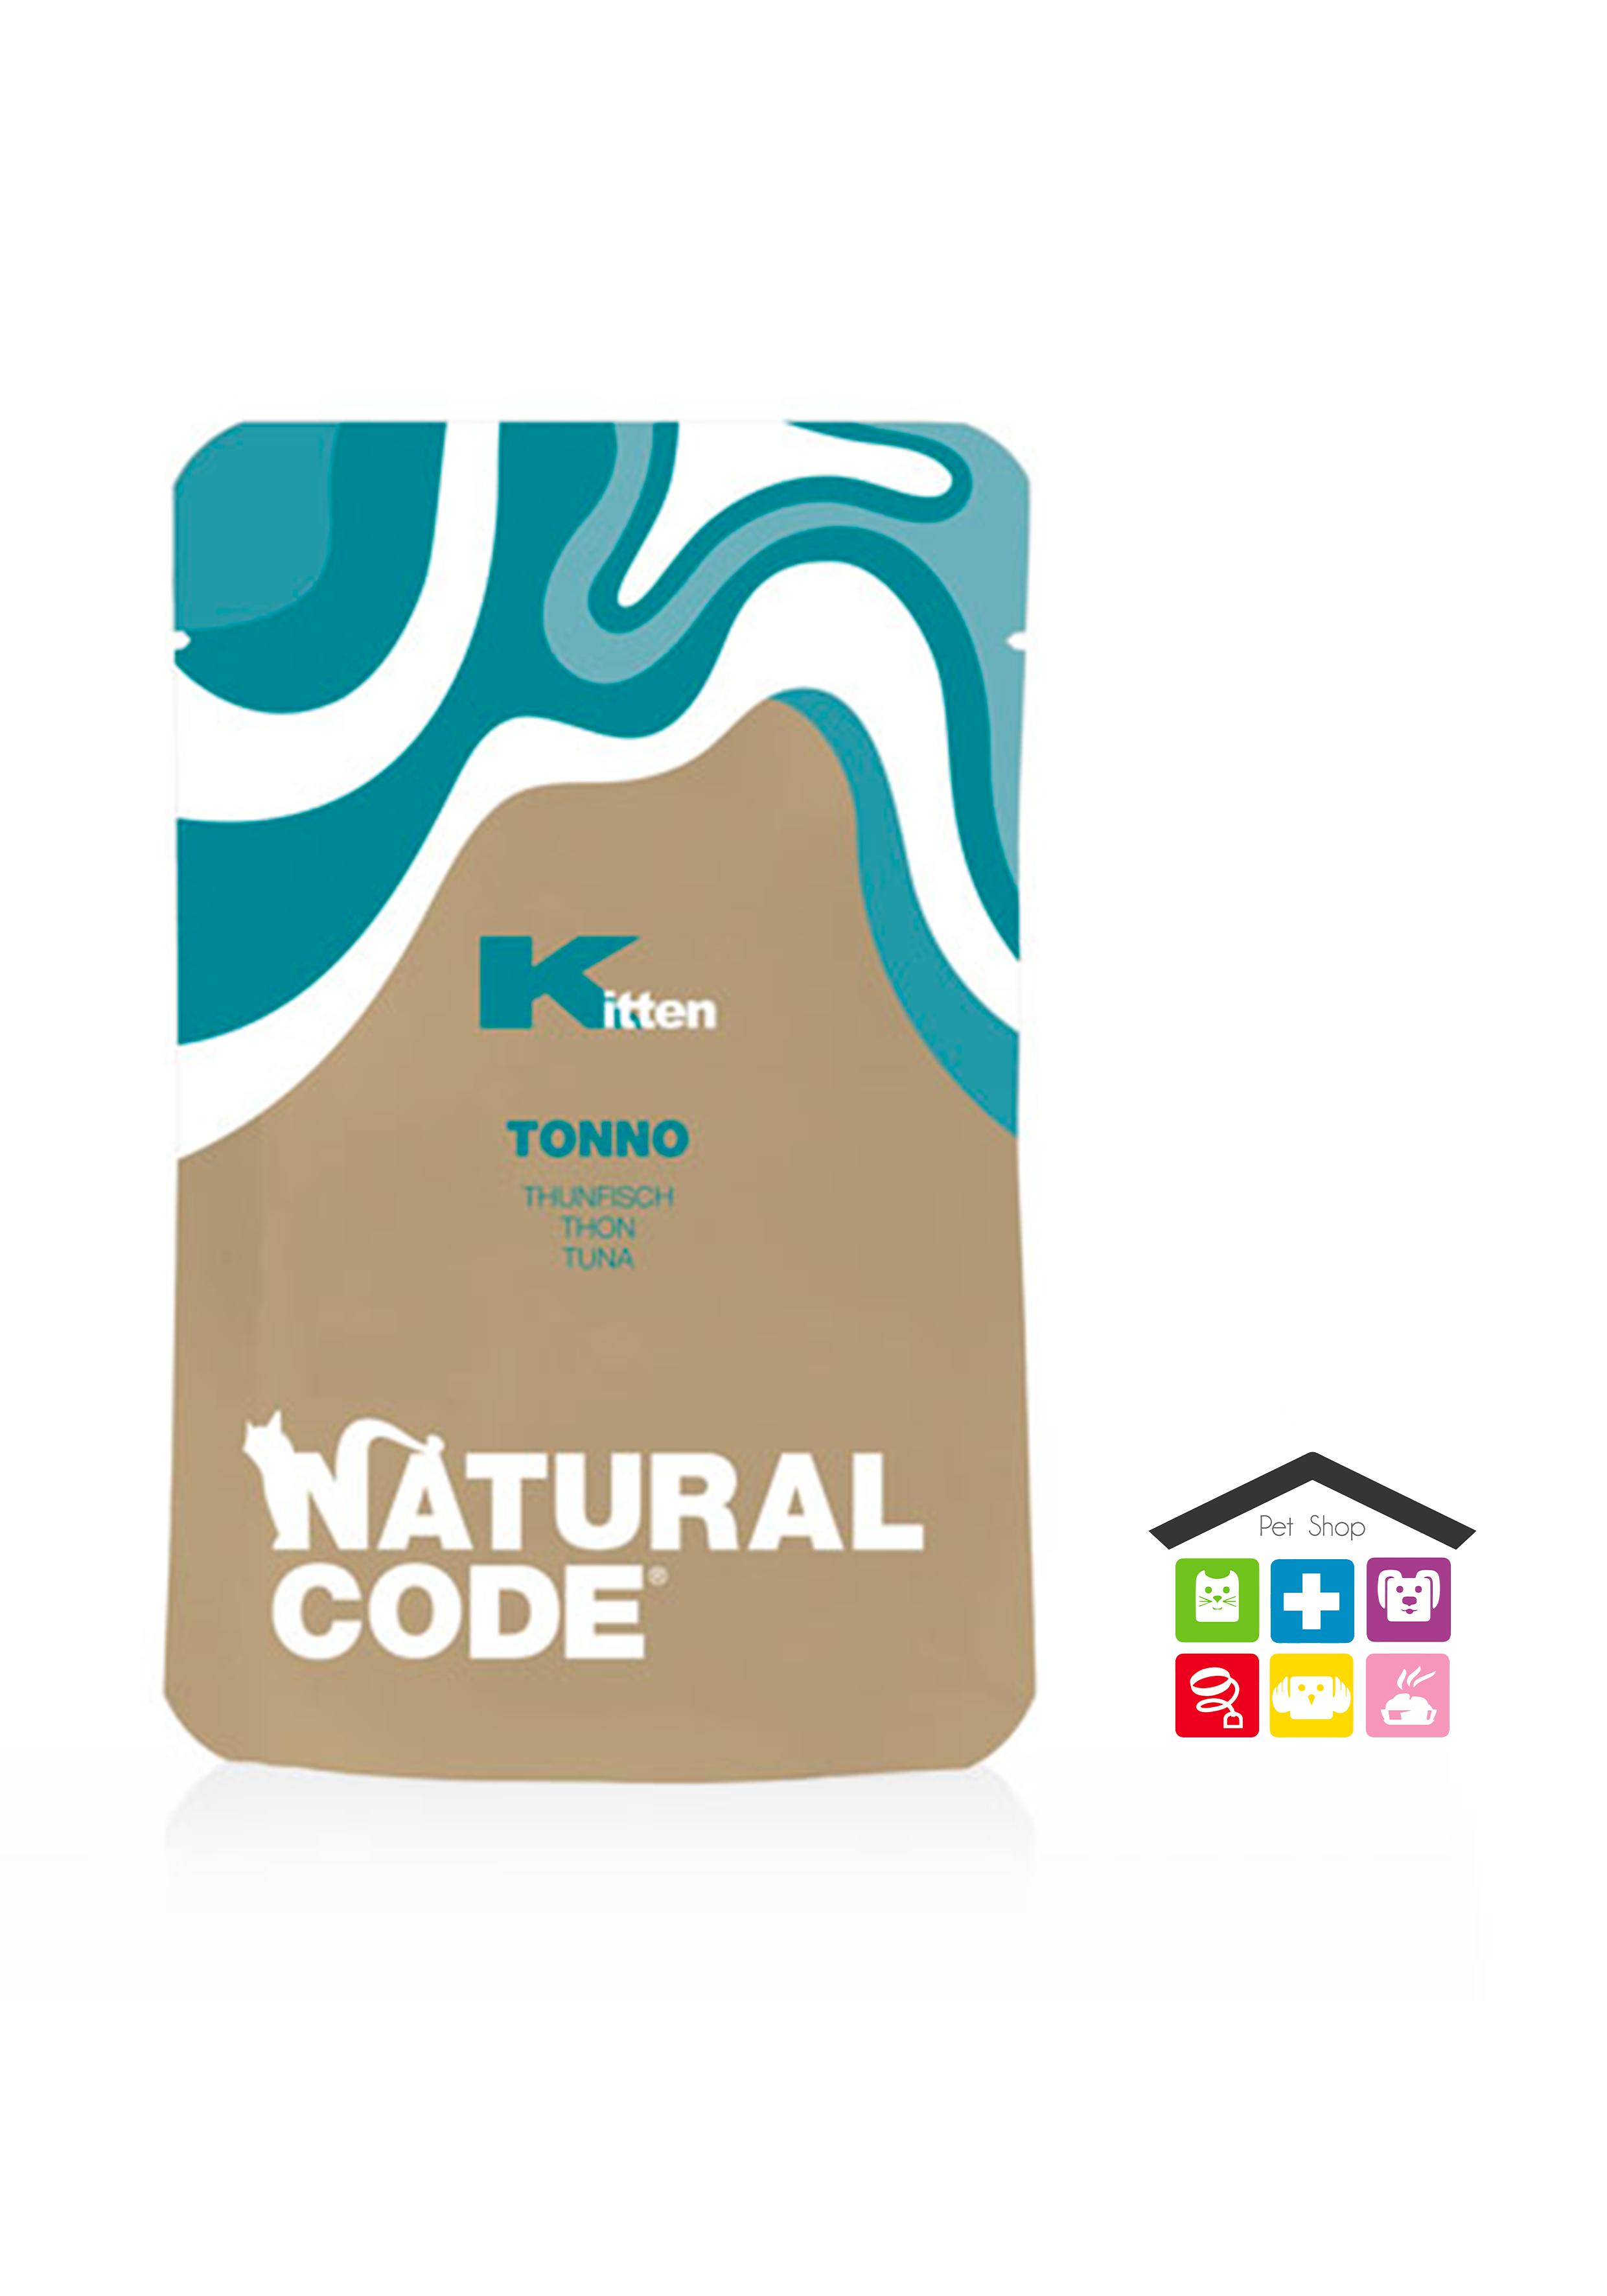 Natural code busta kitten 0,70g tonno